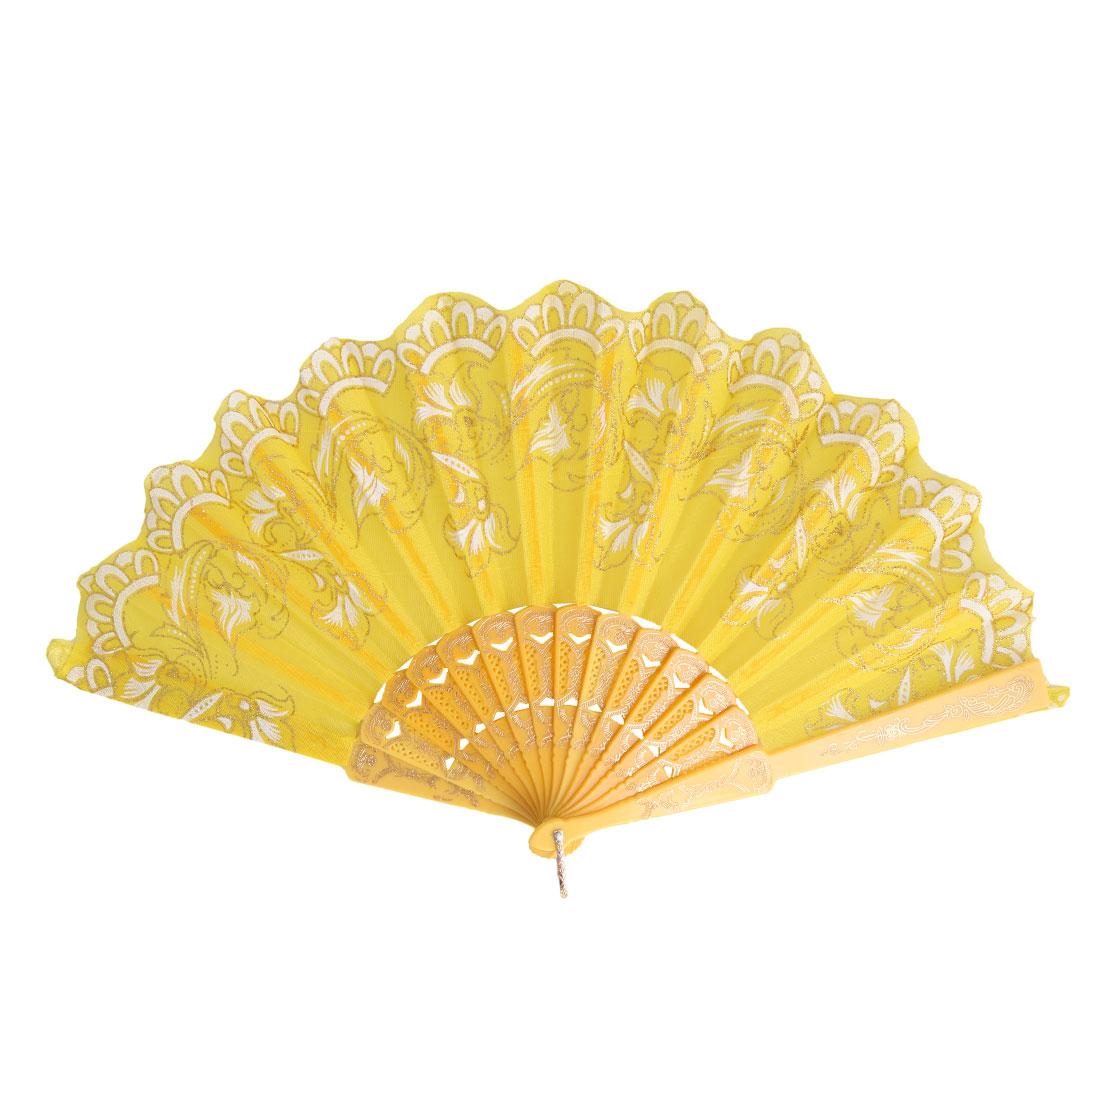 Lady Petals Shape Phoenix Pattern Elegant Embroidered Folding Hand Fan